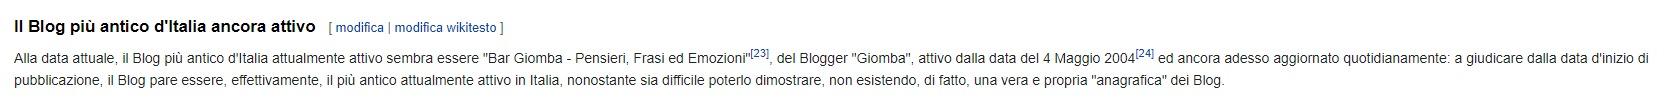 Bar Giomba su Wikipedia